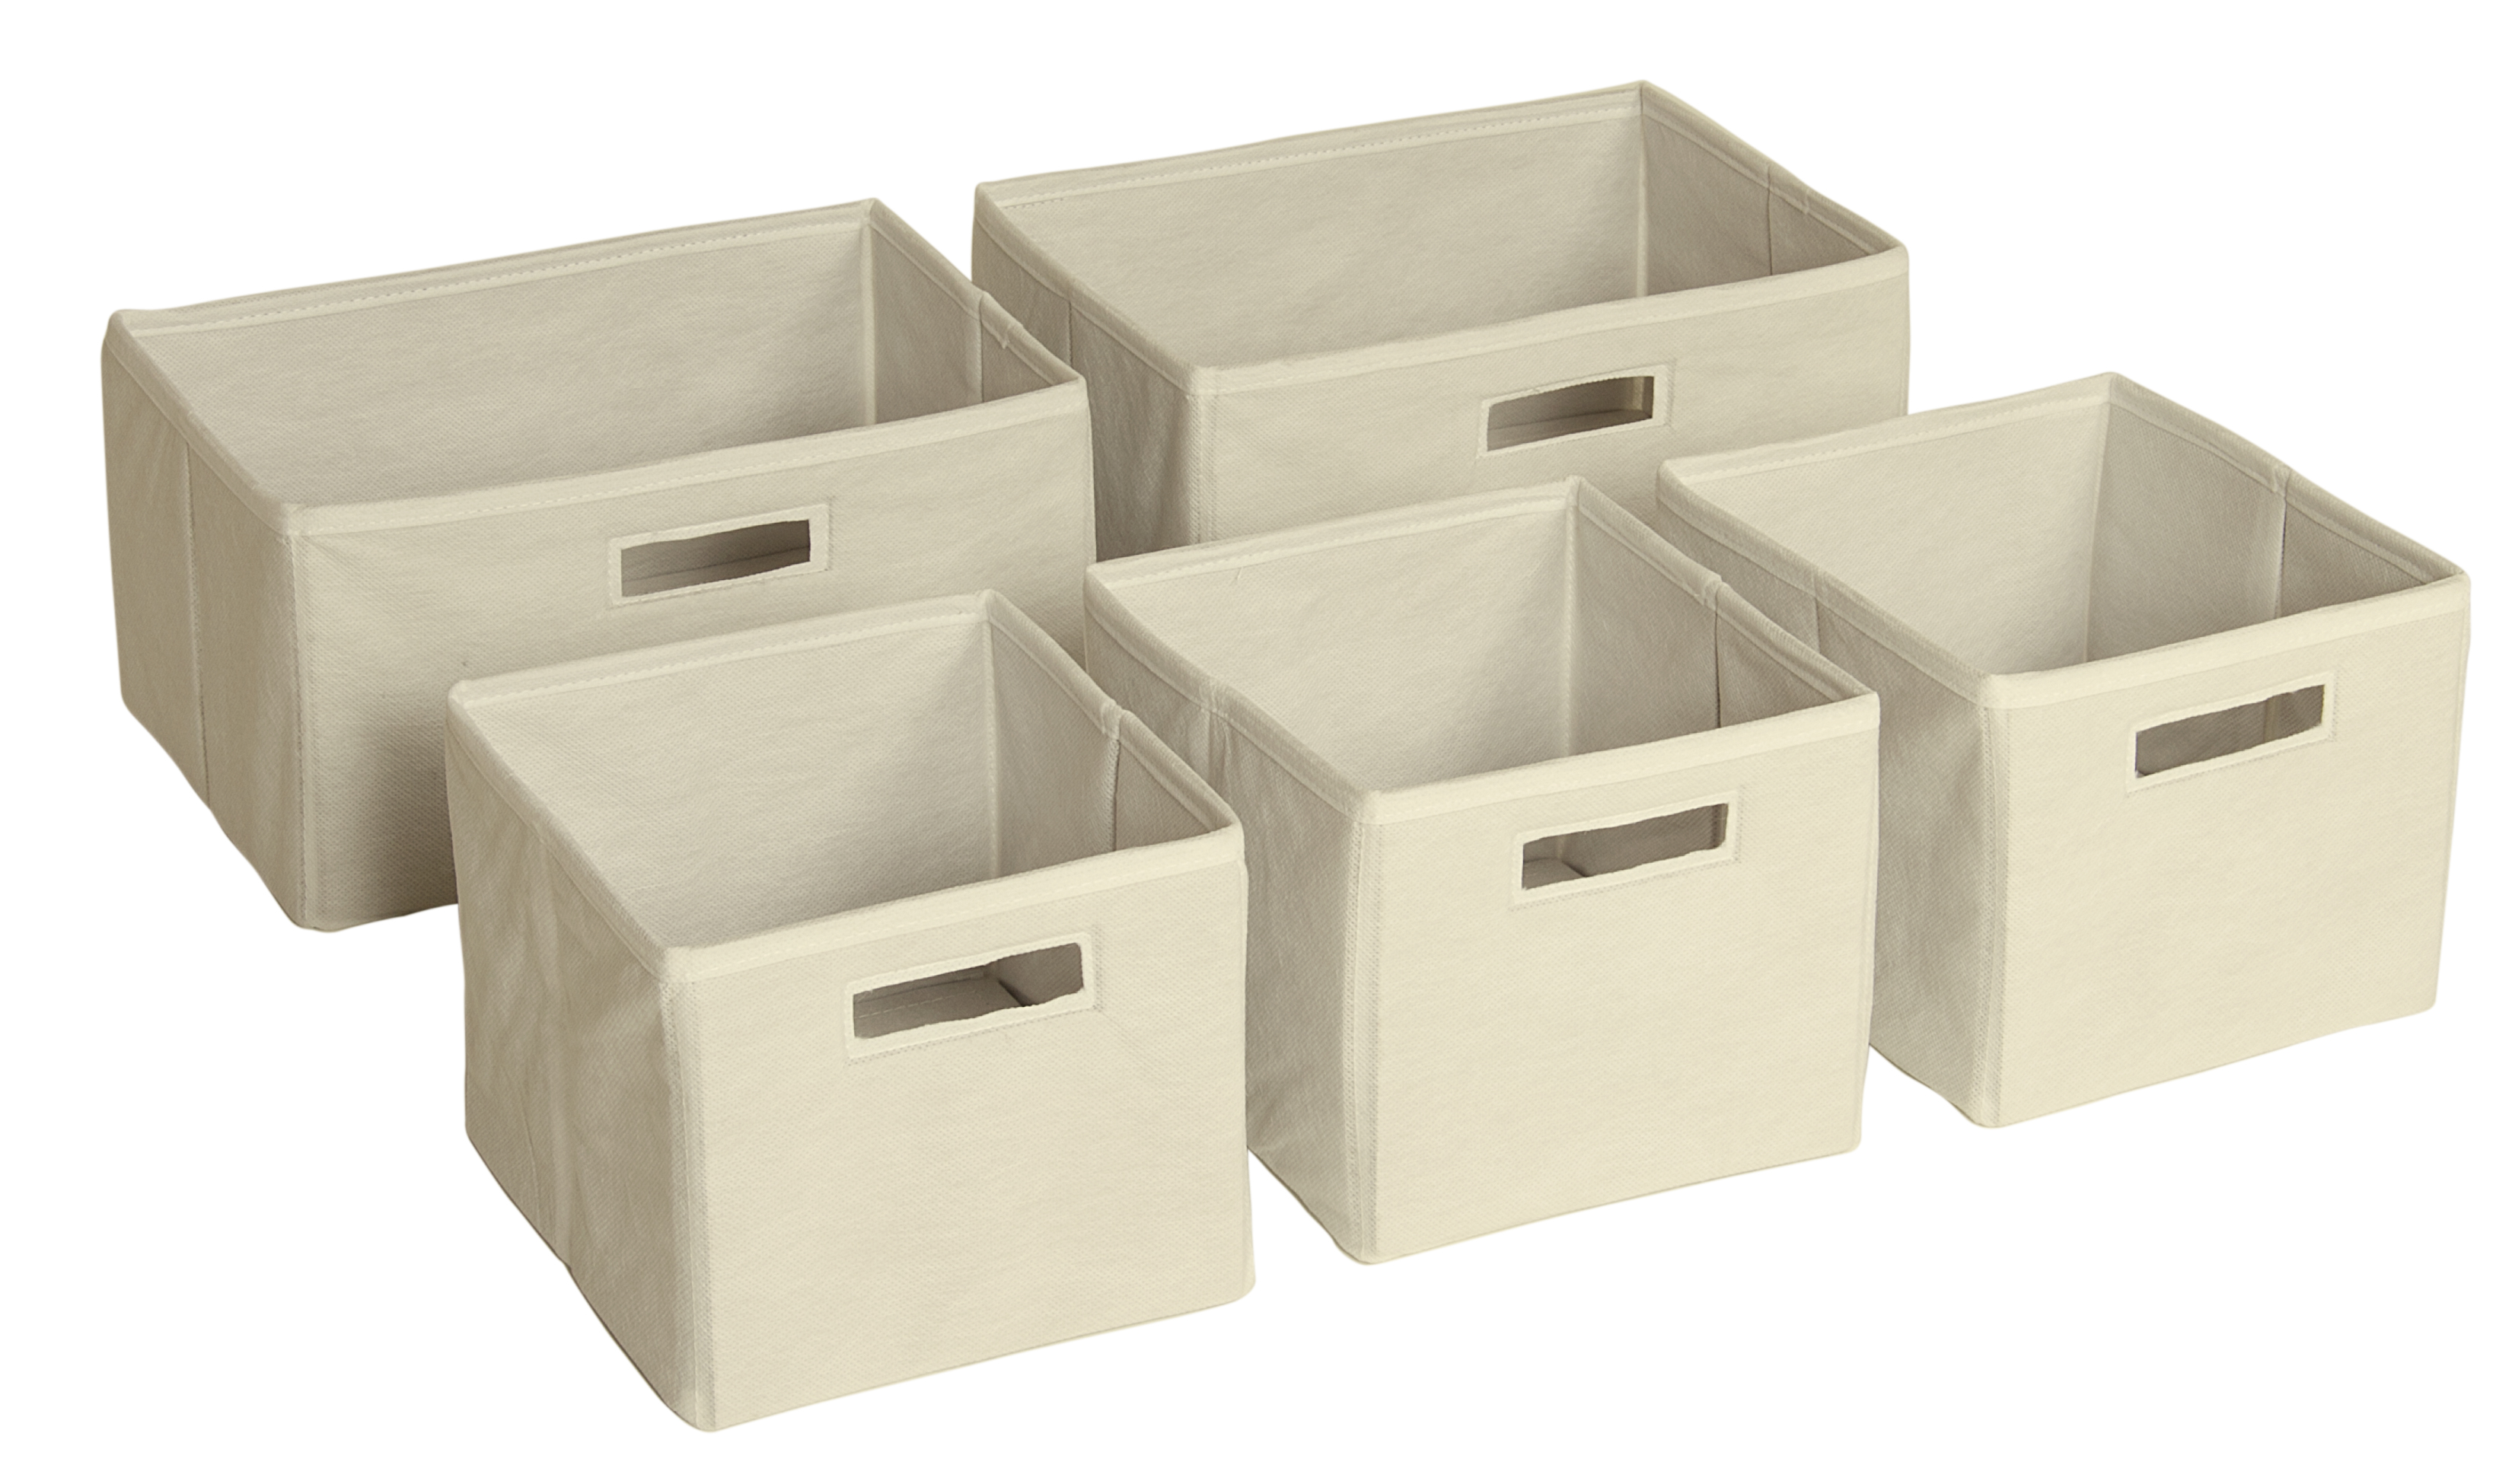 I Love These Tan Storage Bins ...